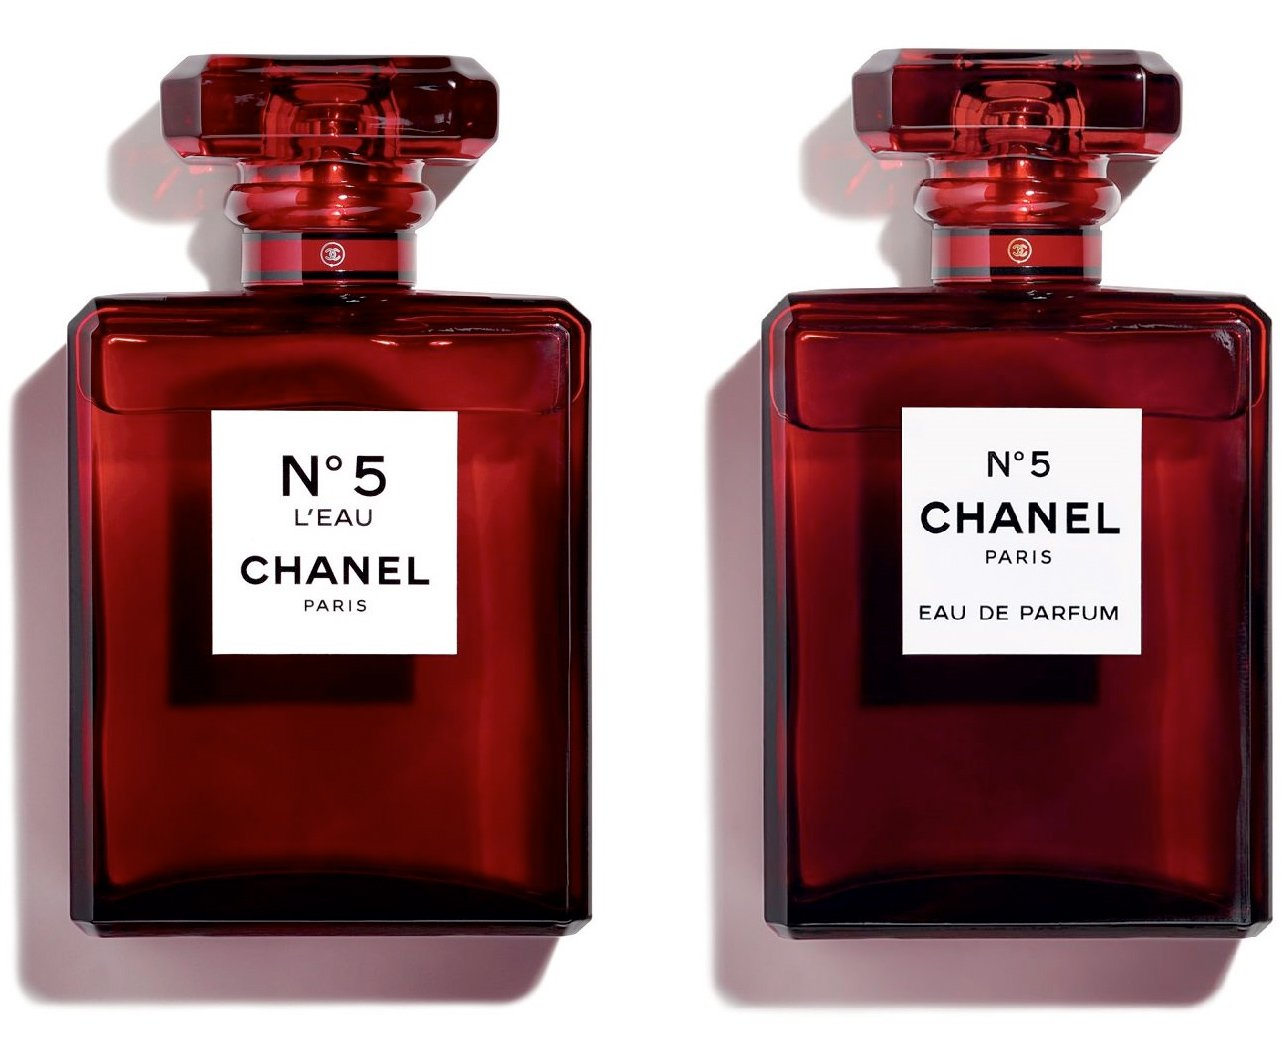 CHANEL N°5 Red Edition Esprit de Gabrielle espritdegabrielle.com